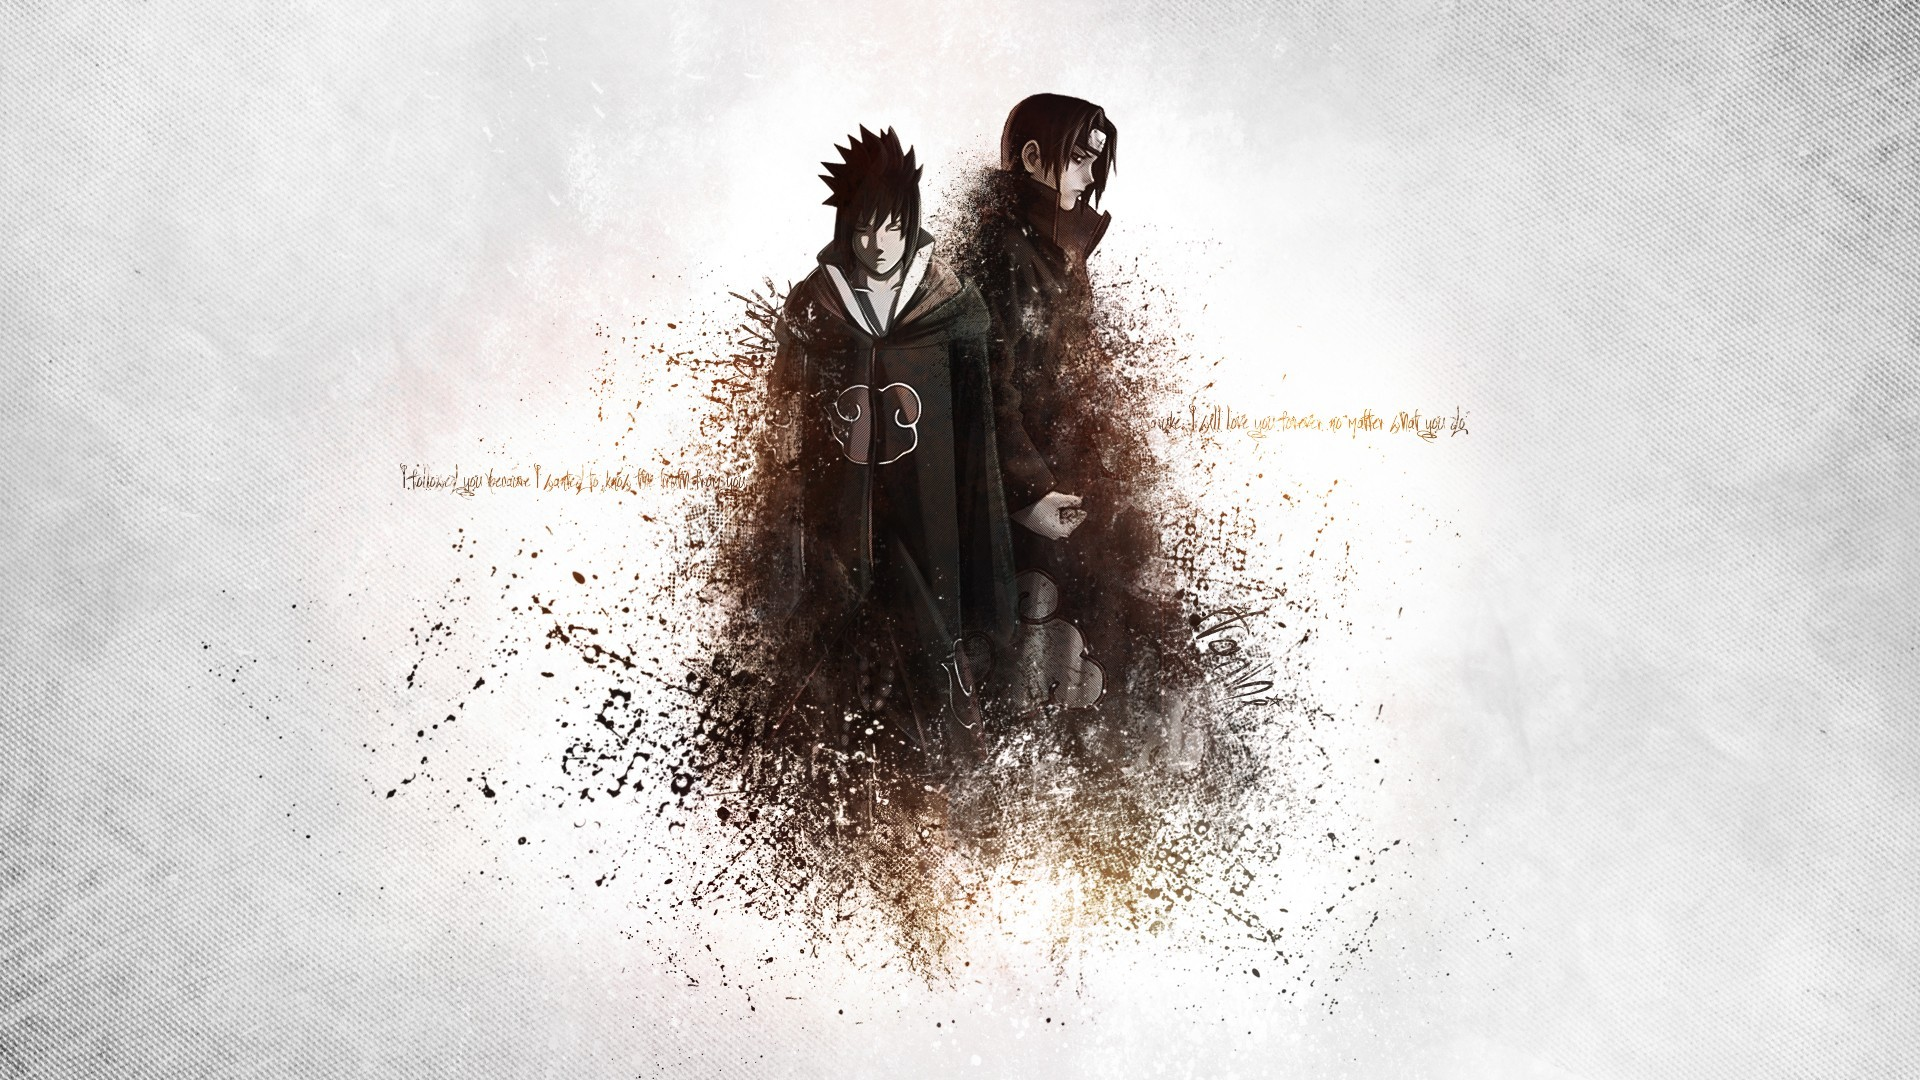 Sasuke And Itachi Hd Wallpaper 1080p #24045 Wallpaper | High